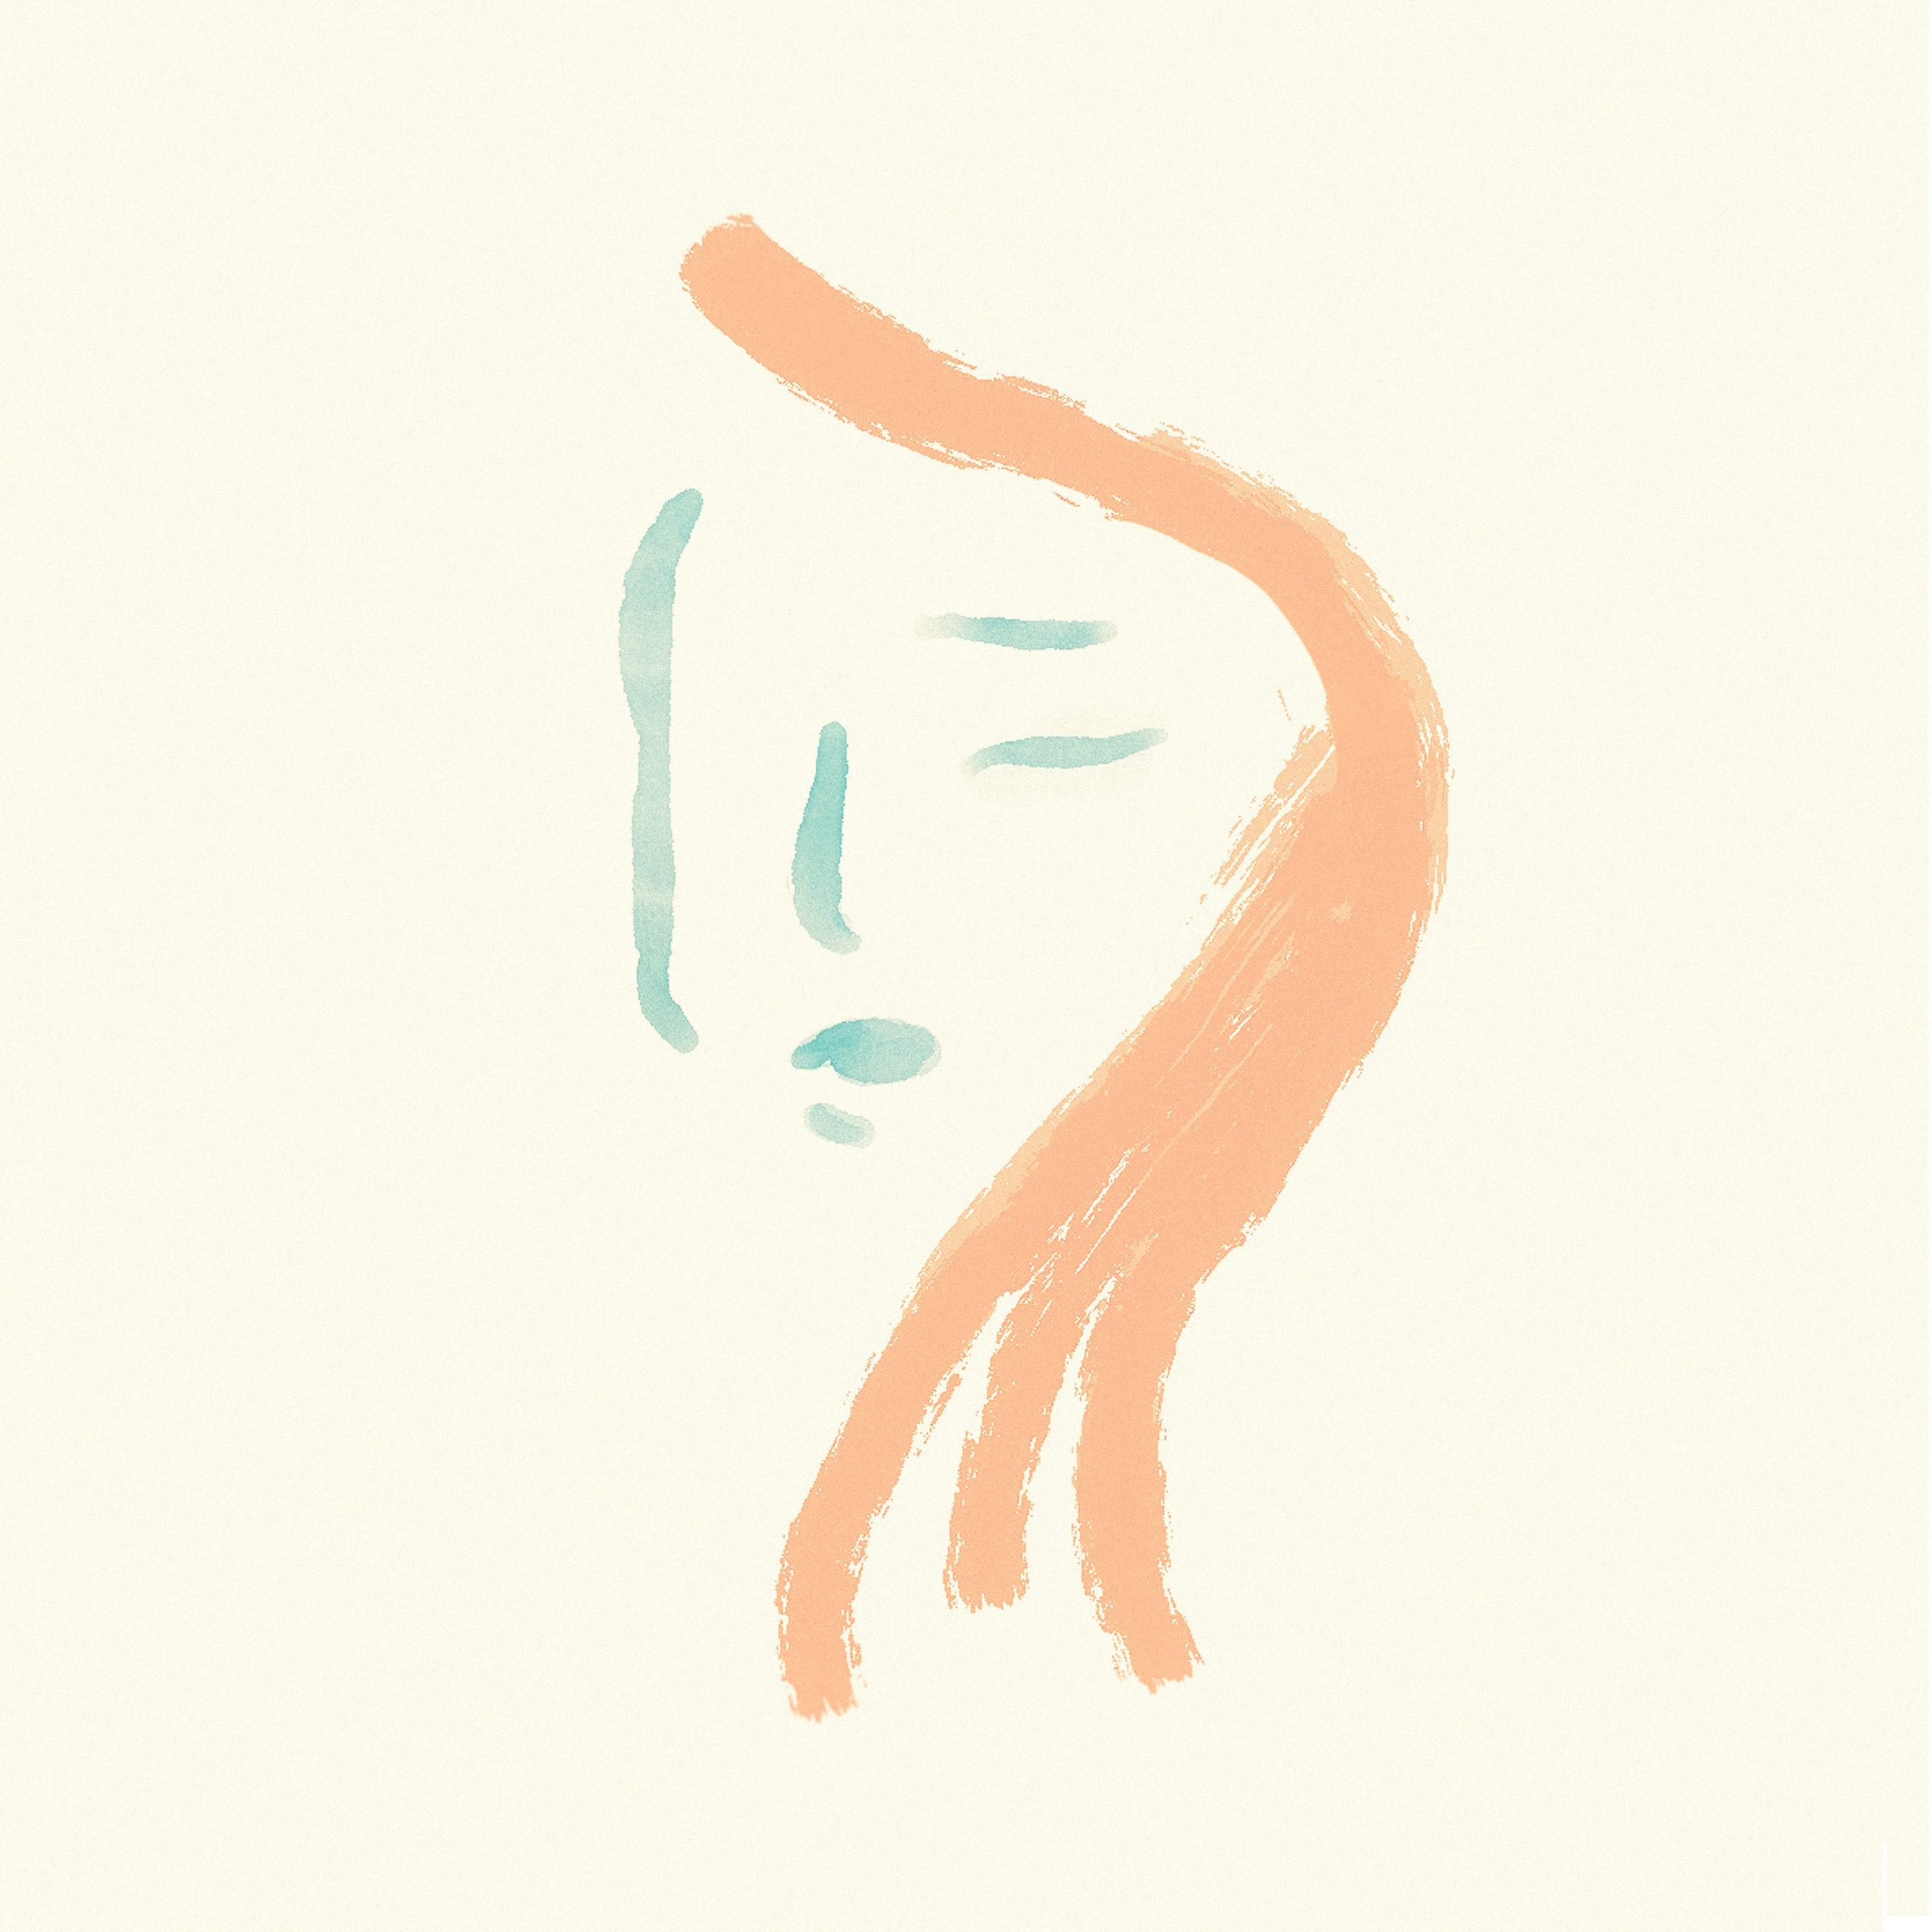 New EP from Savannah King